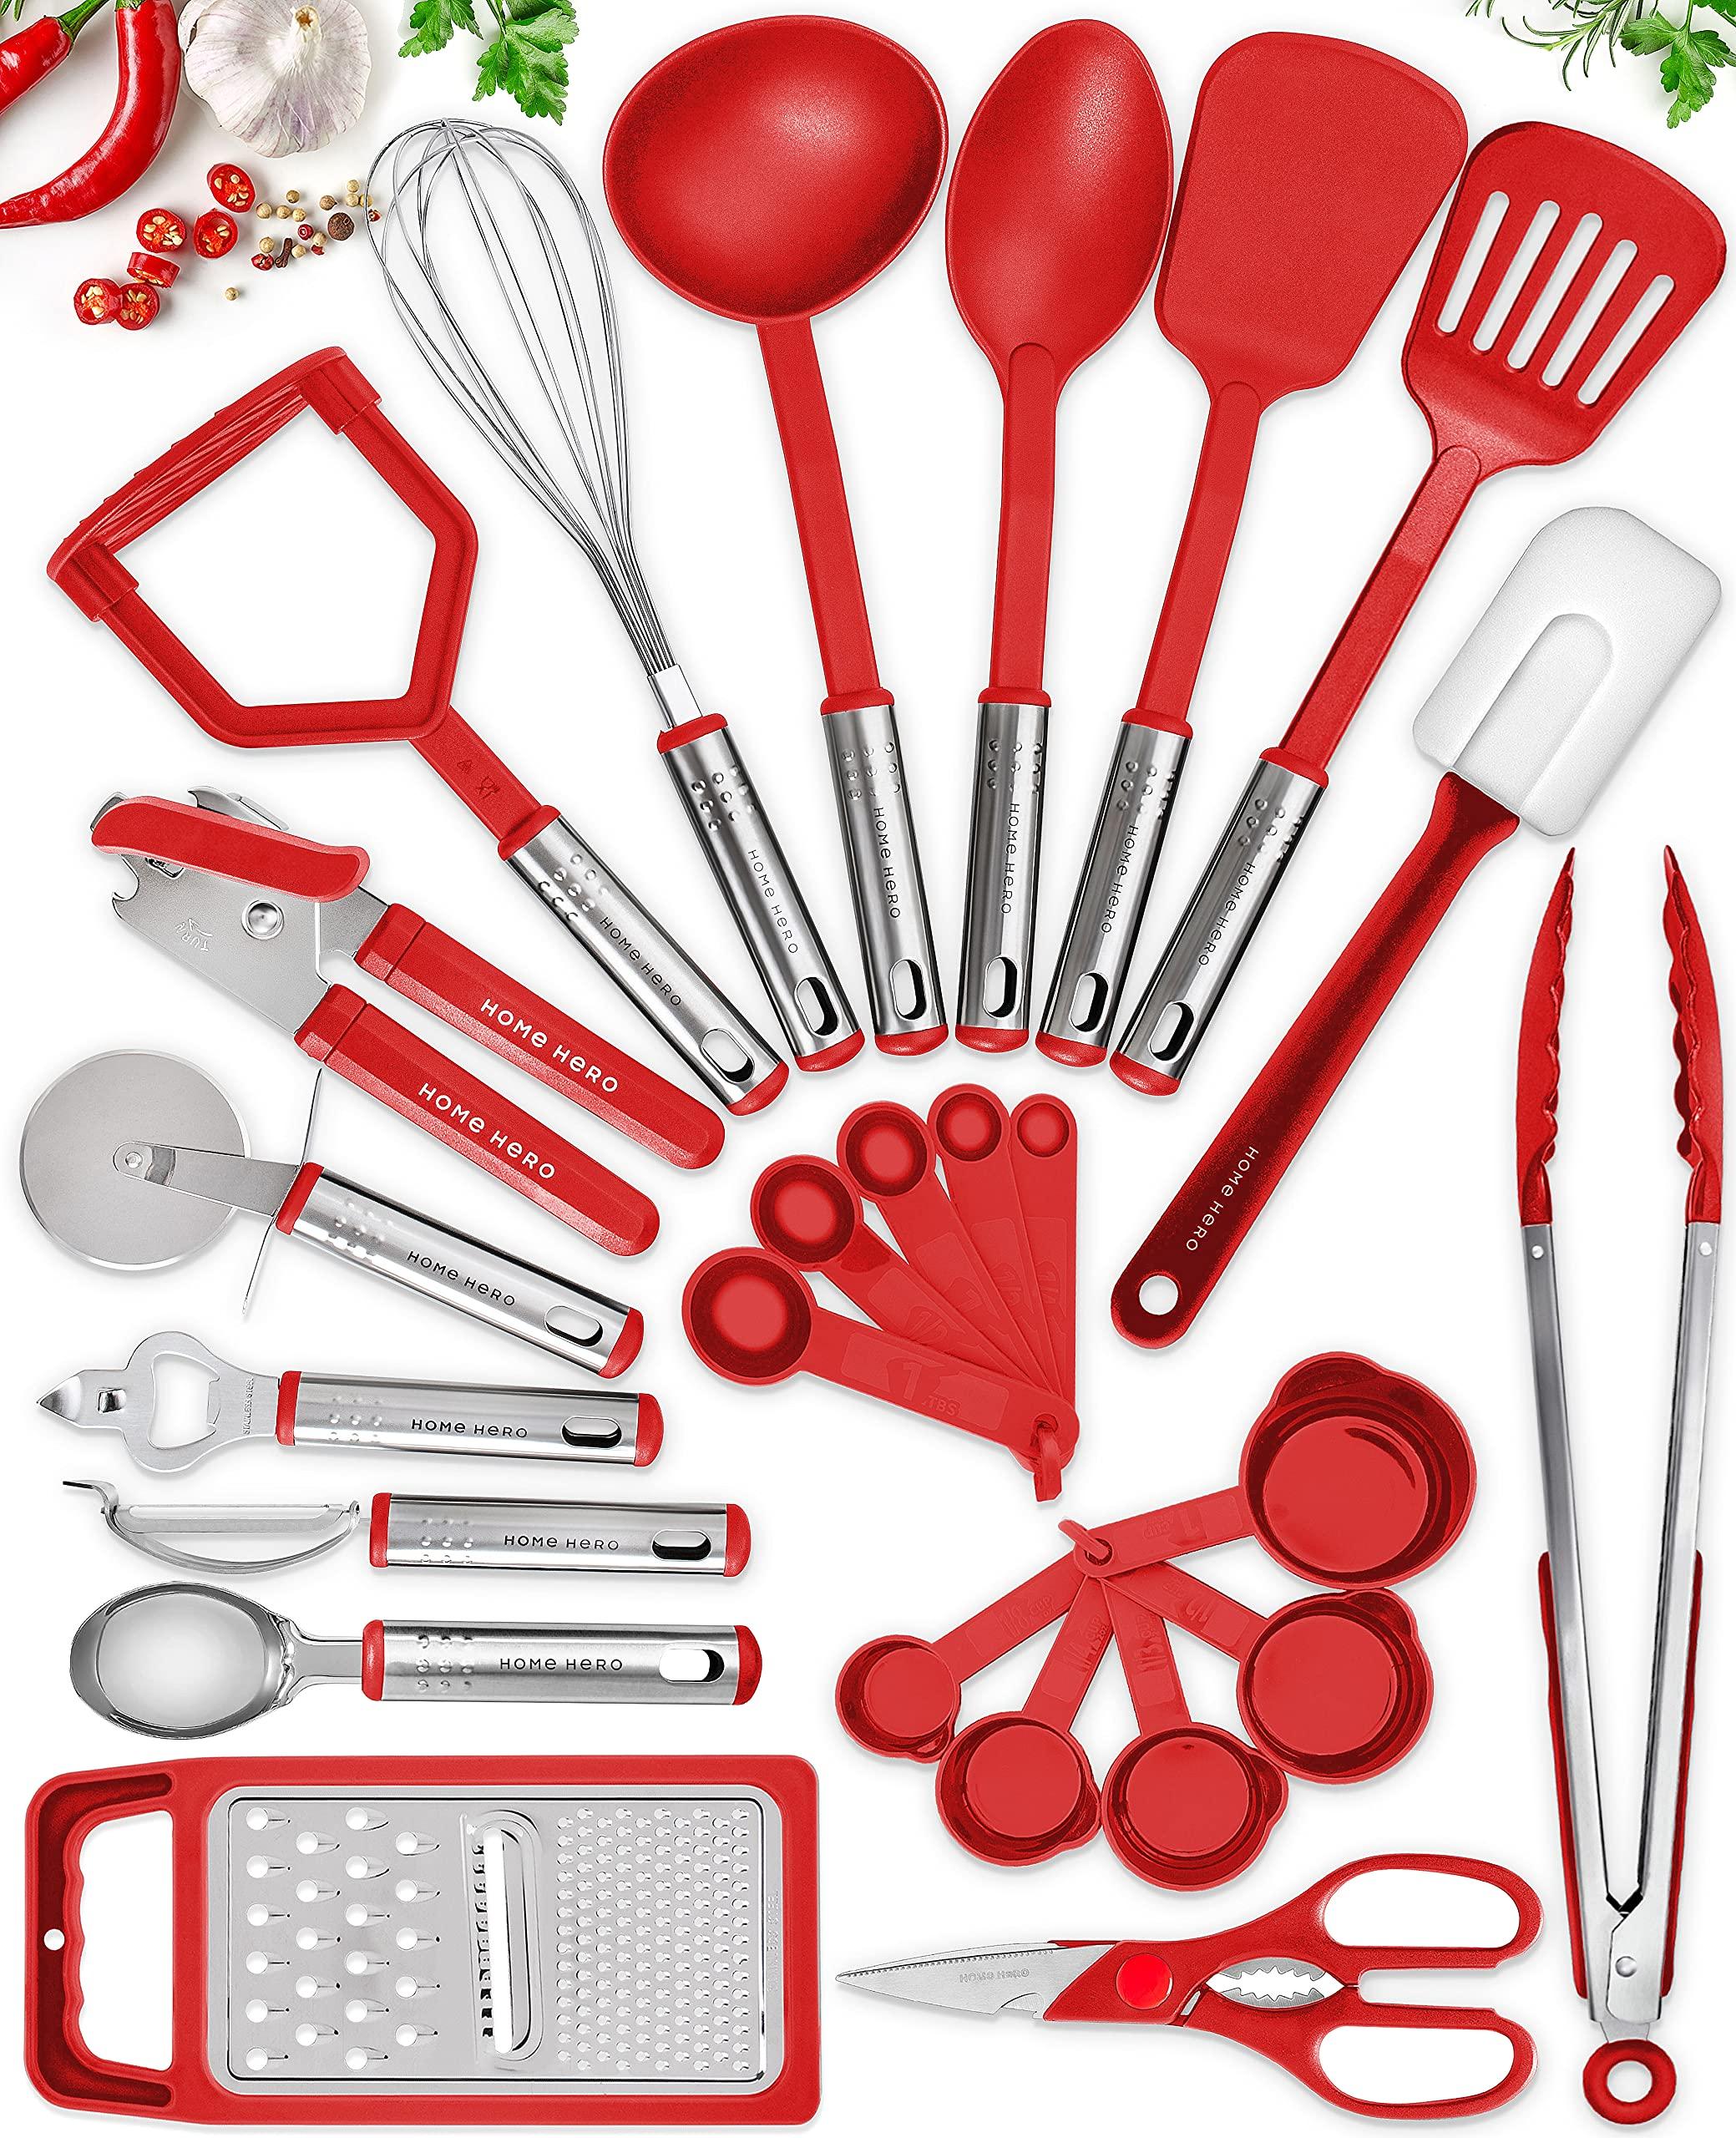 25 Kitchen Utensil Set Home Hero - Nylon Cooking Utensils - Kitchen Utensils with Spatula - Kitchen Gadgets Cookware Set -...